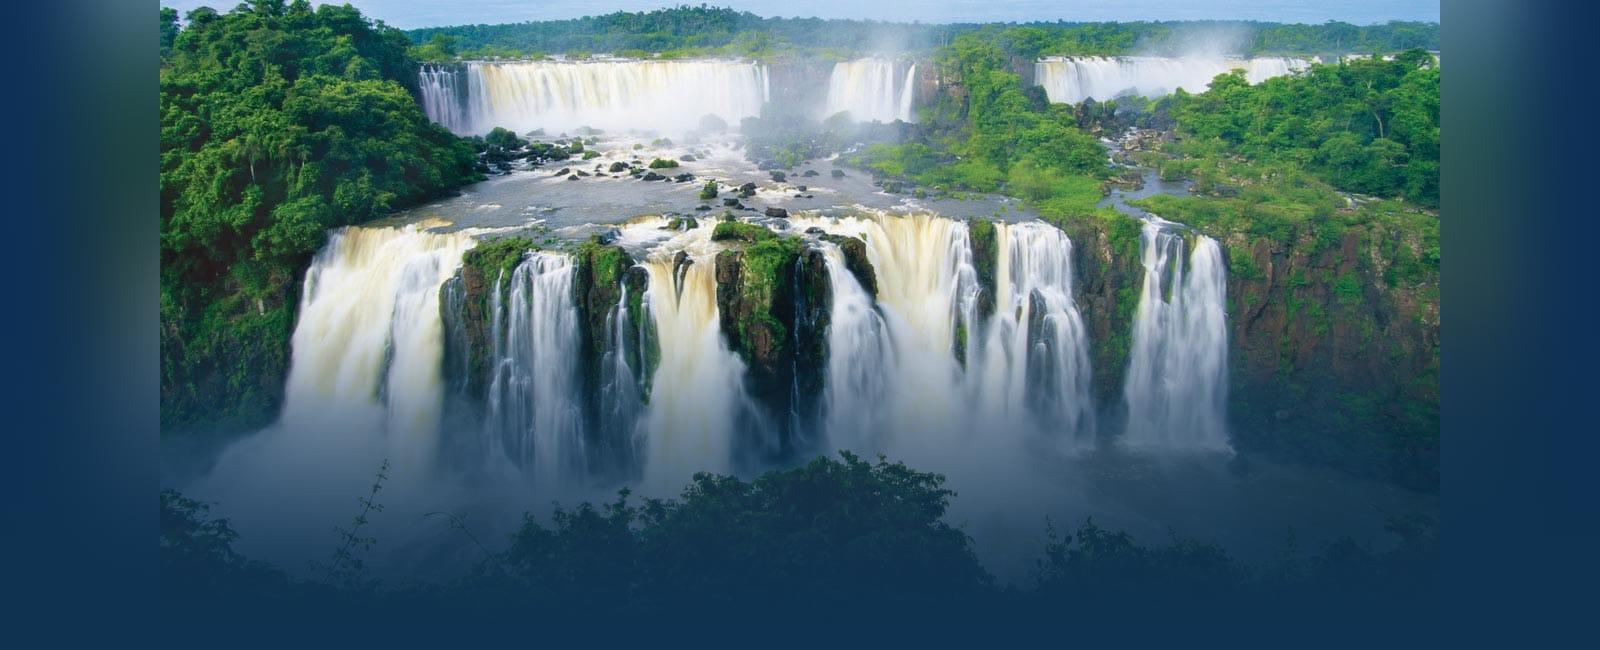 south america cruises amazon cruises cruises south america iguazuacute falls